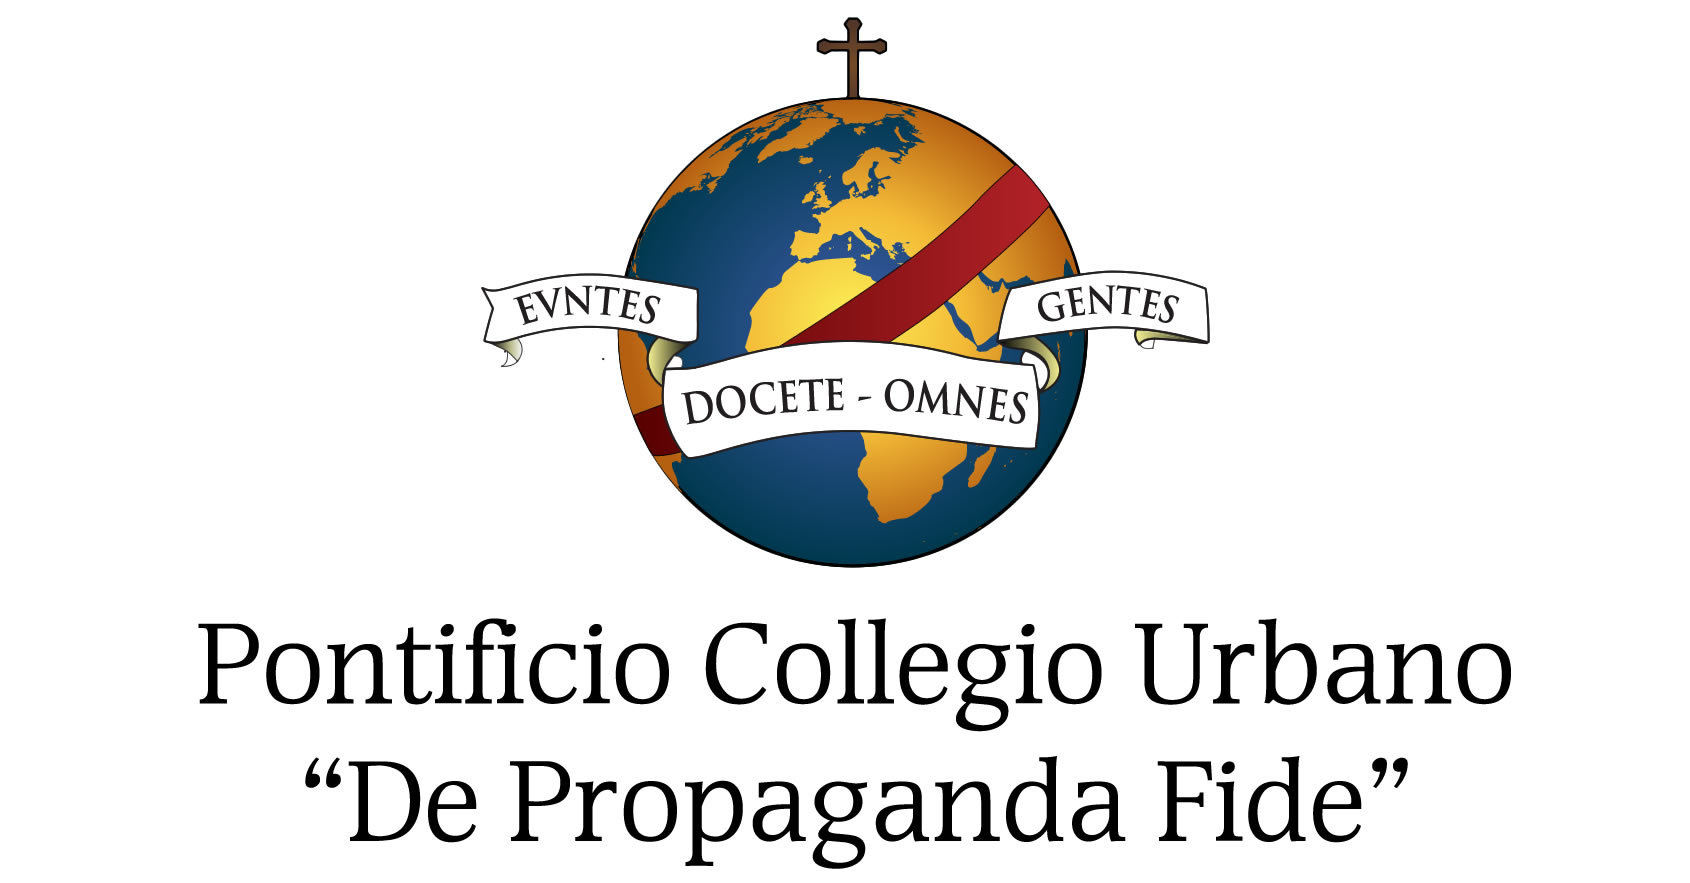 collegio-urbano-roma-logo.jpg